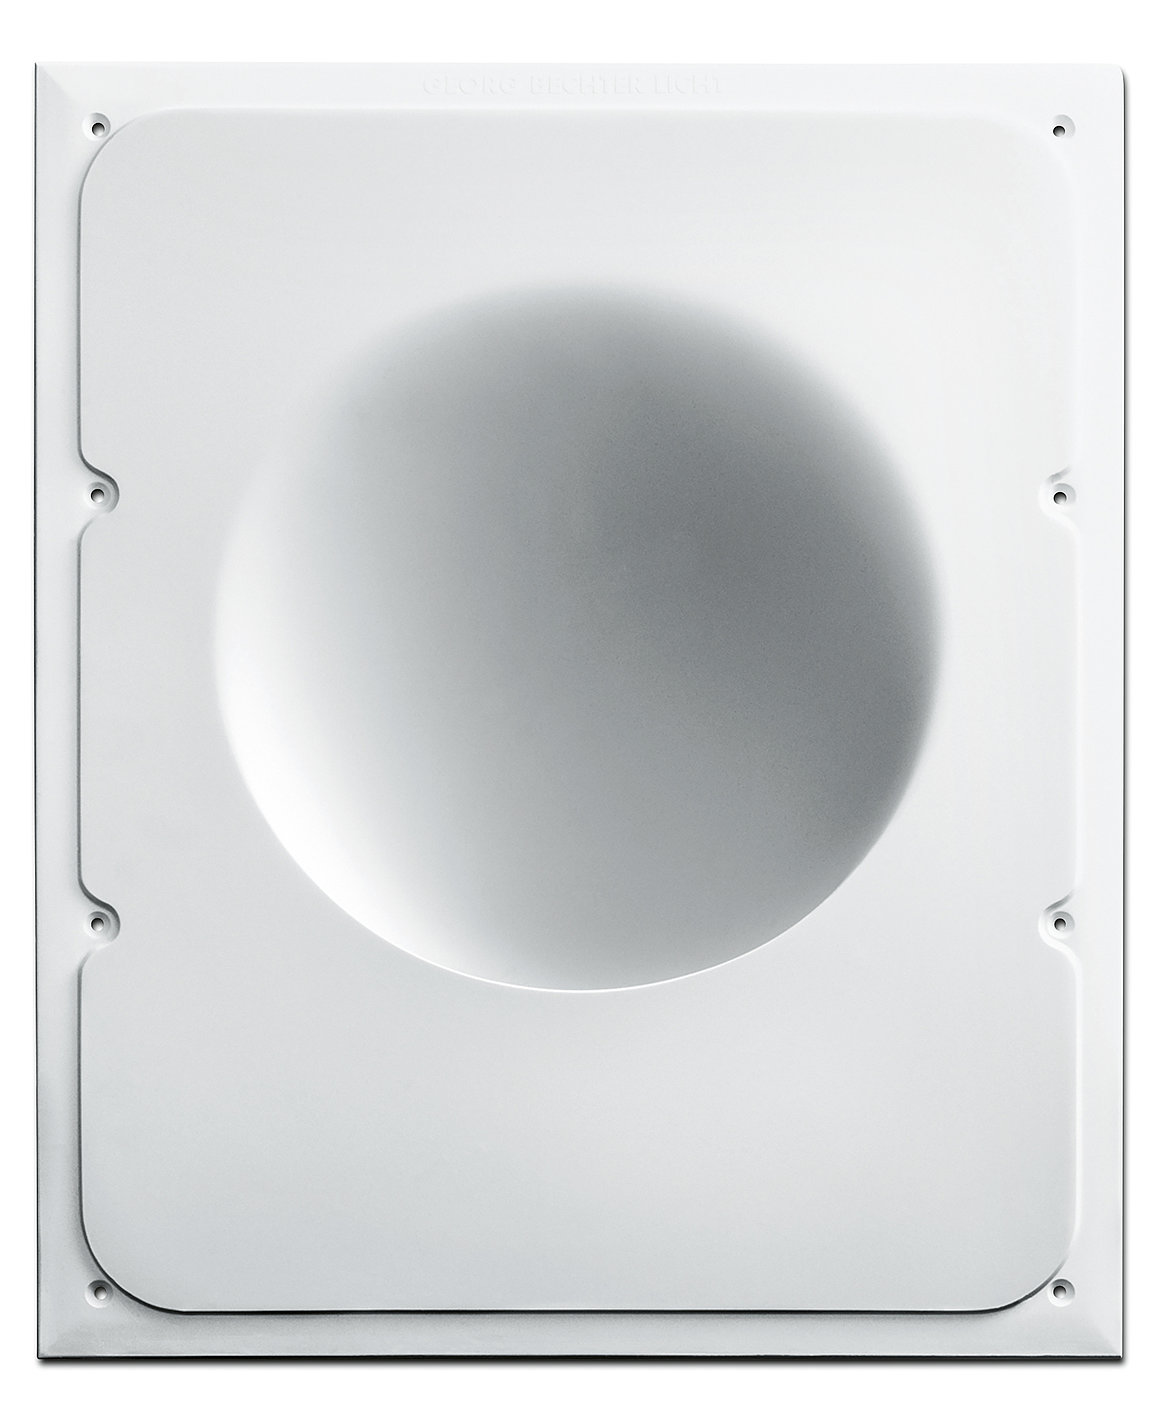 VERVE AIR   Red Dot Design Award